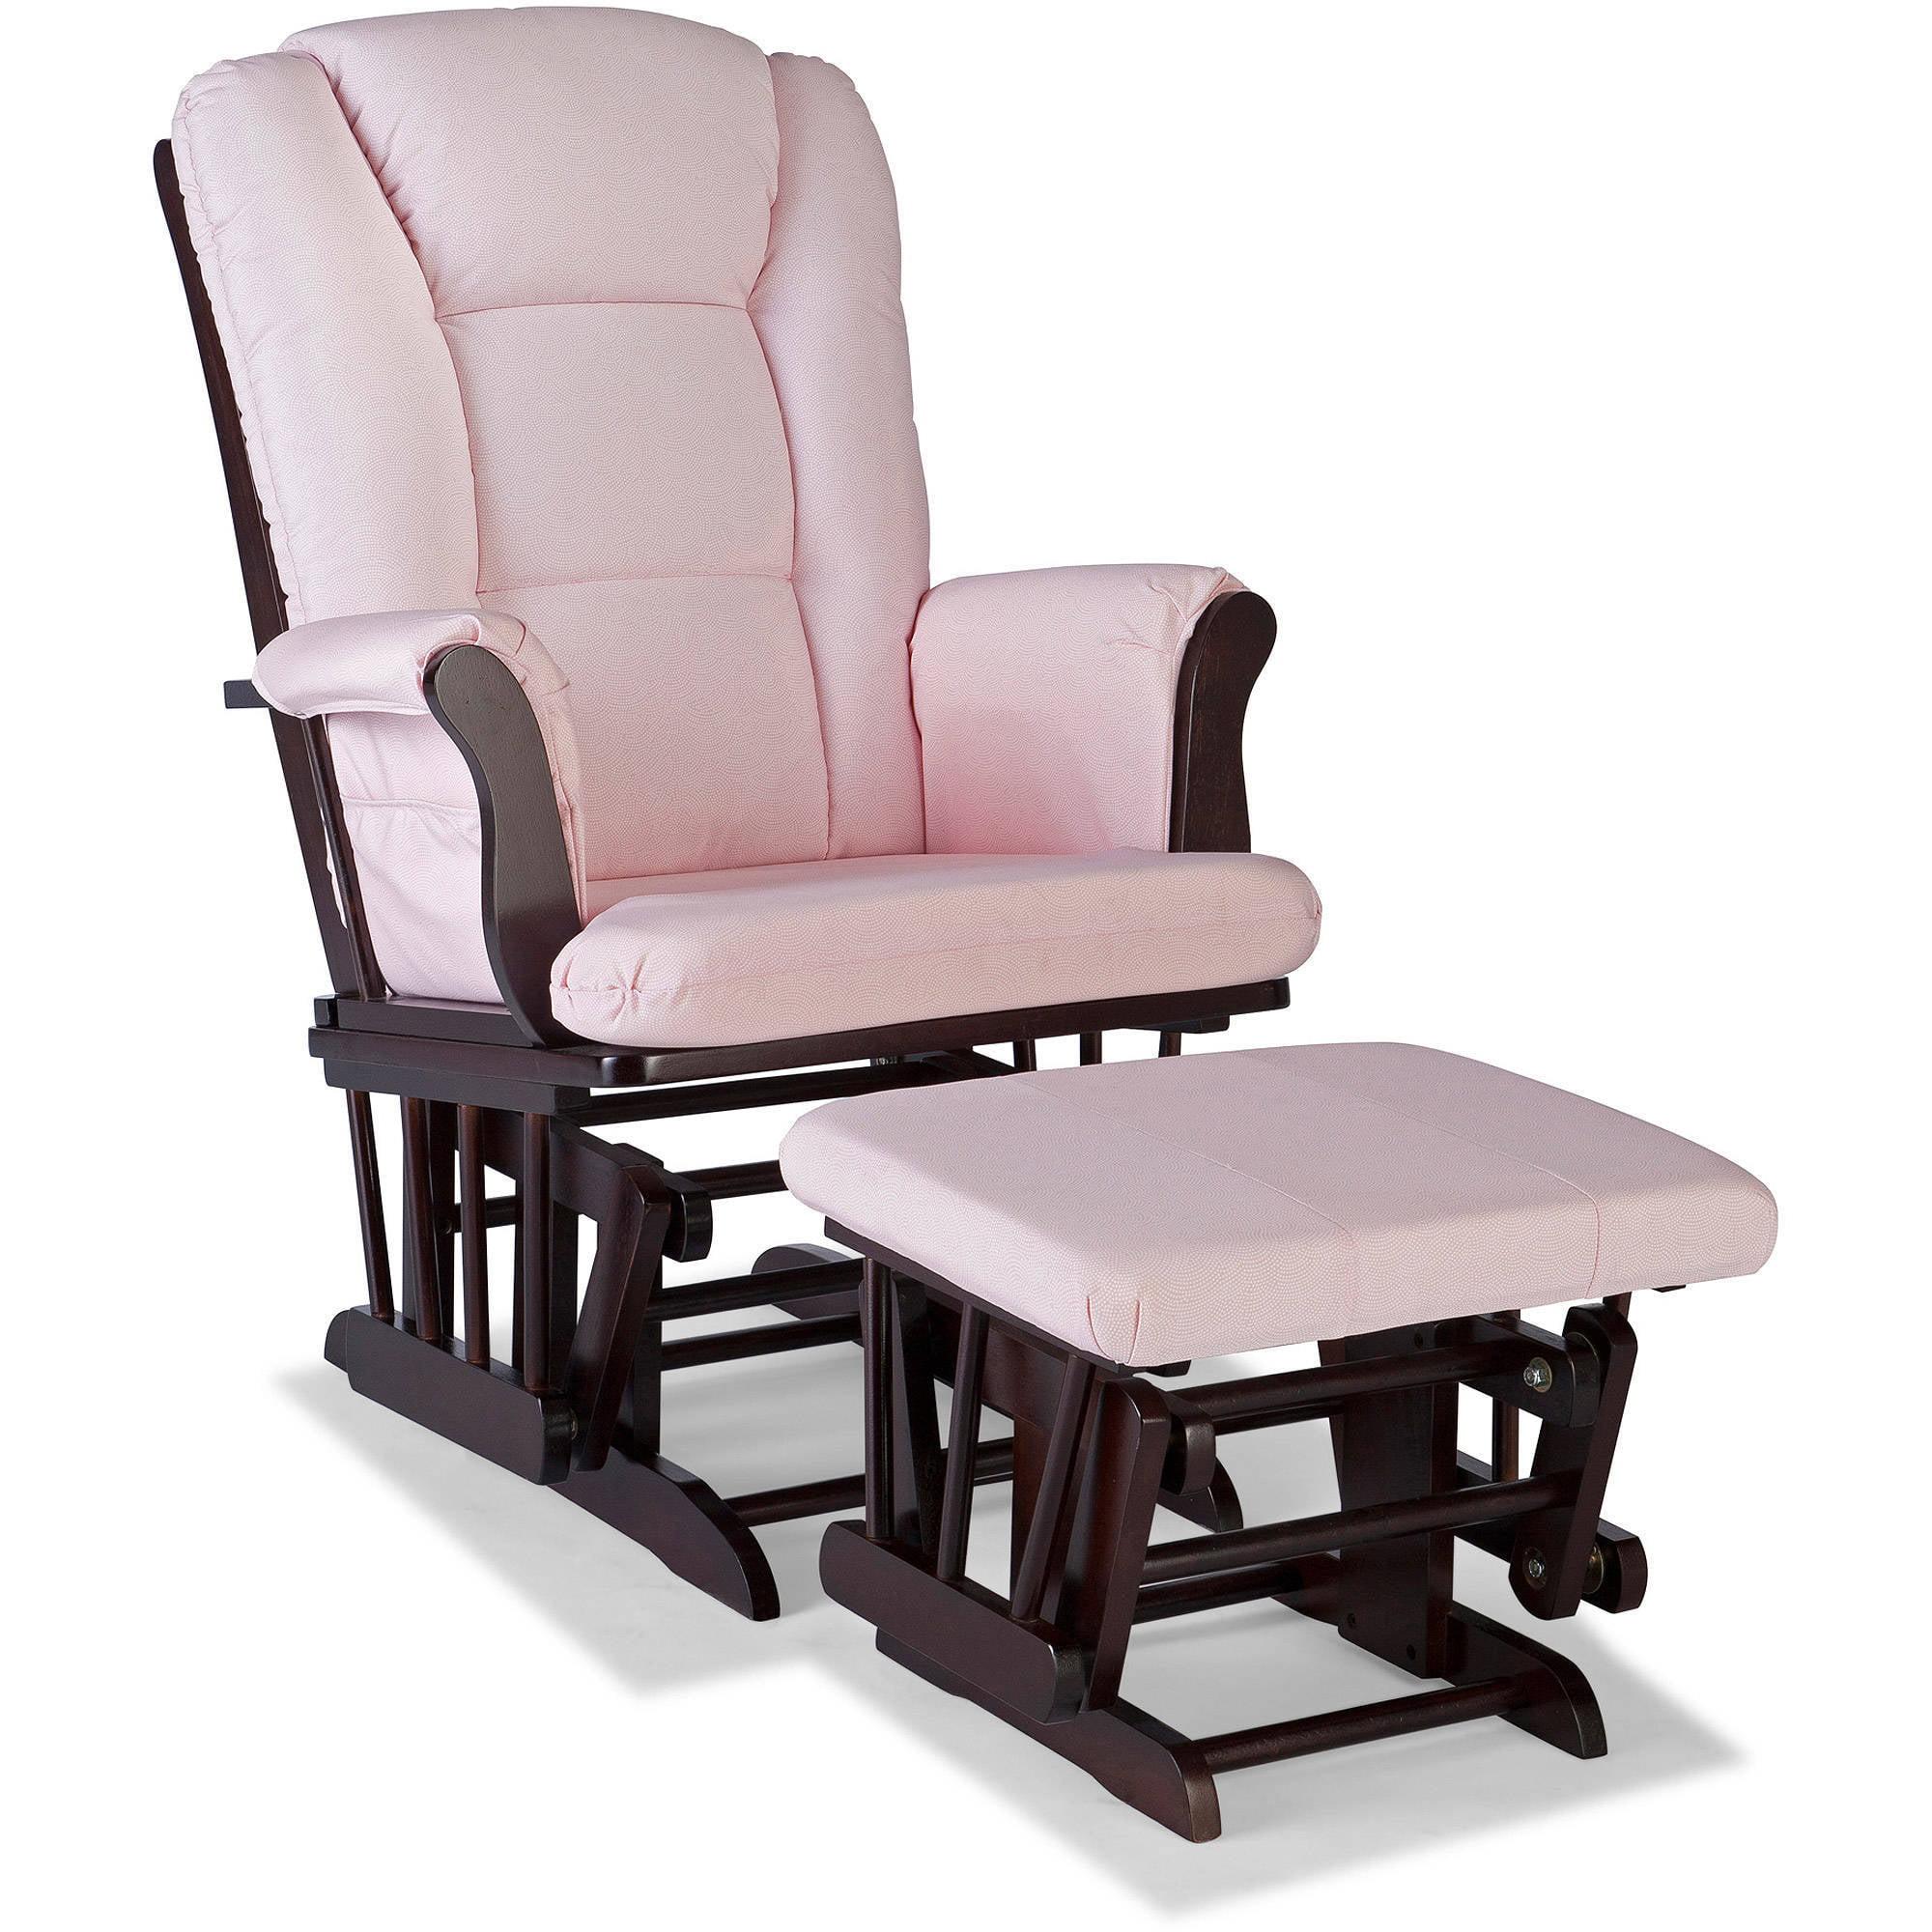 Storkcraft Swirl Tuscany Glider and Ottoman incl Lumbar Pillow, Pink Blush Cushions, Choose Your Finish